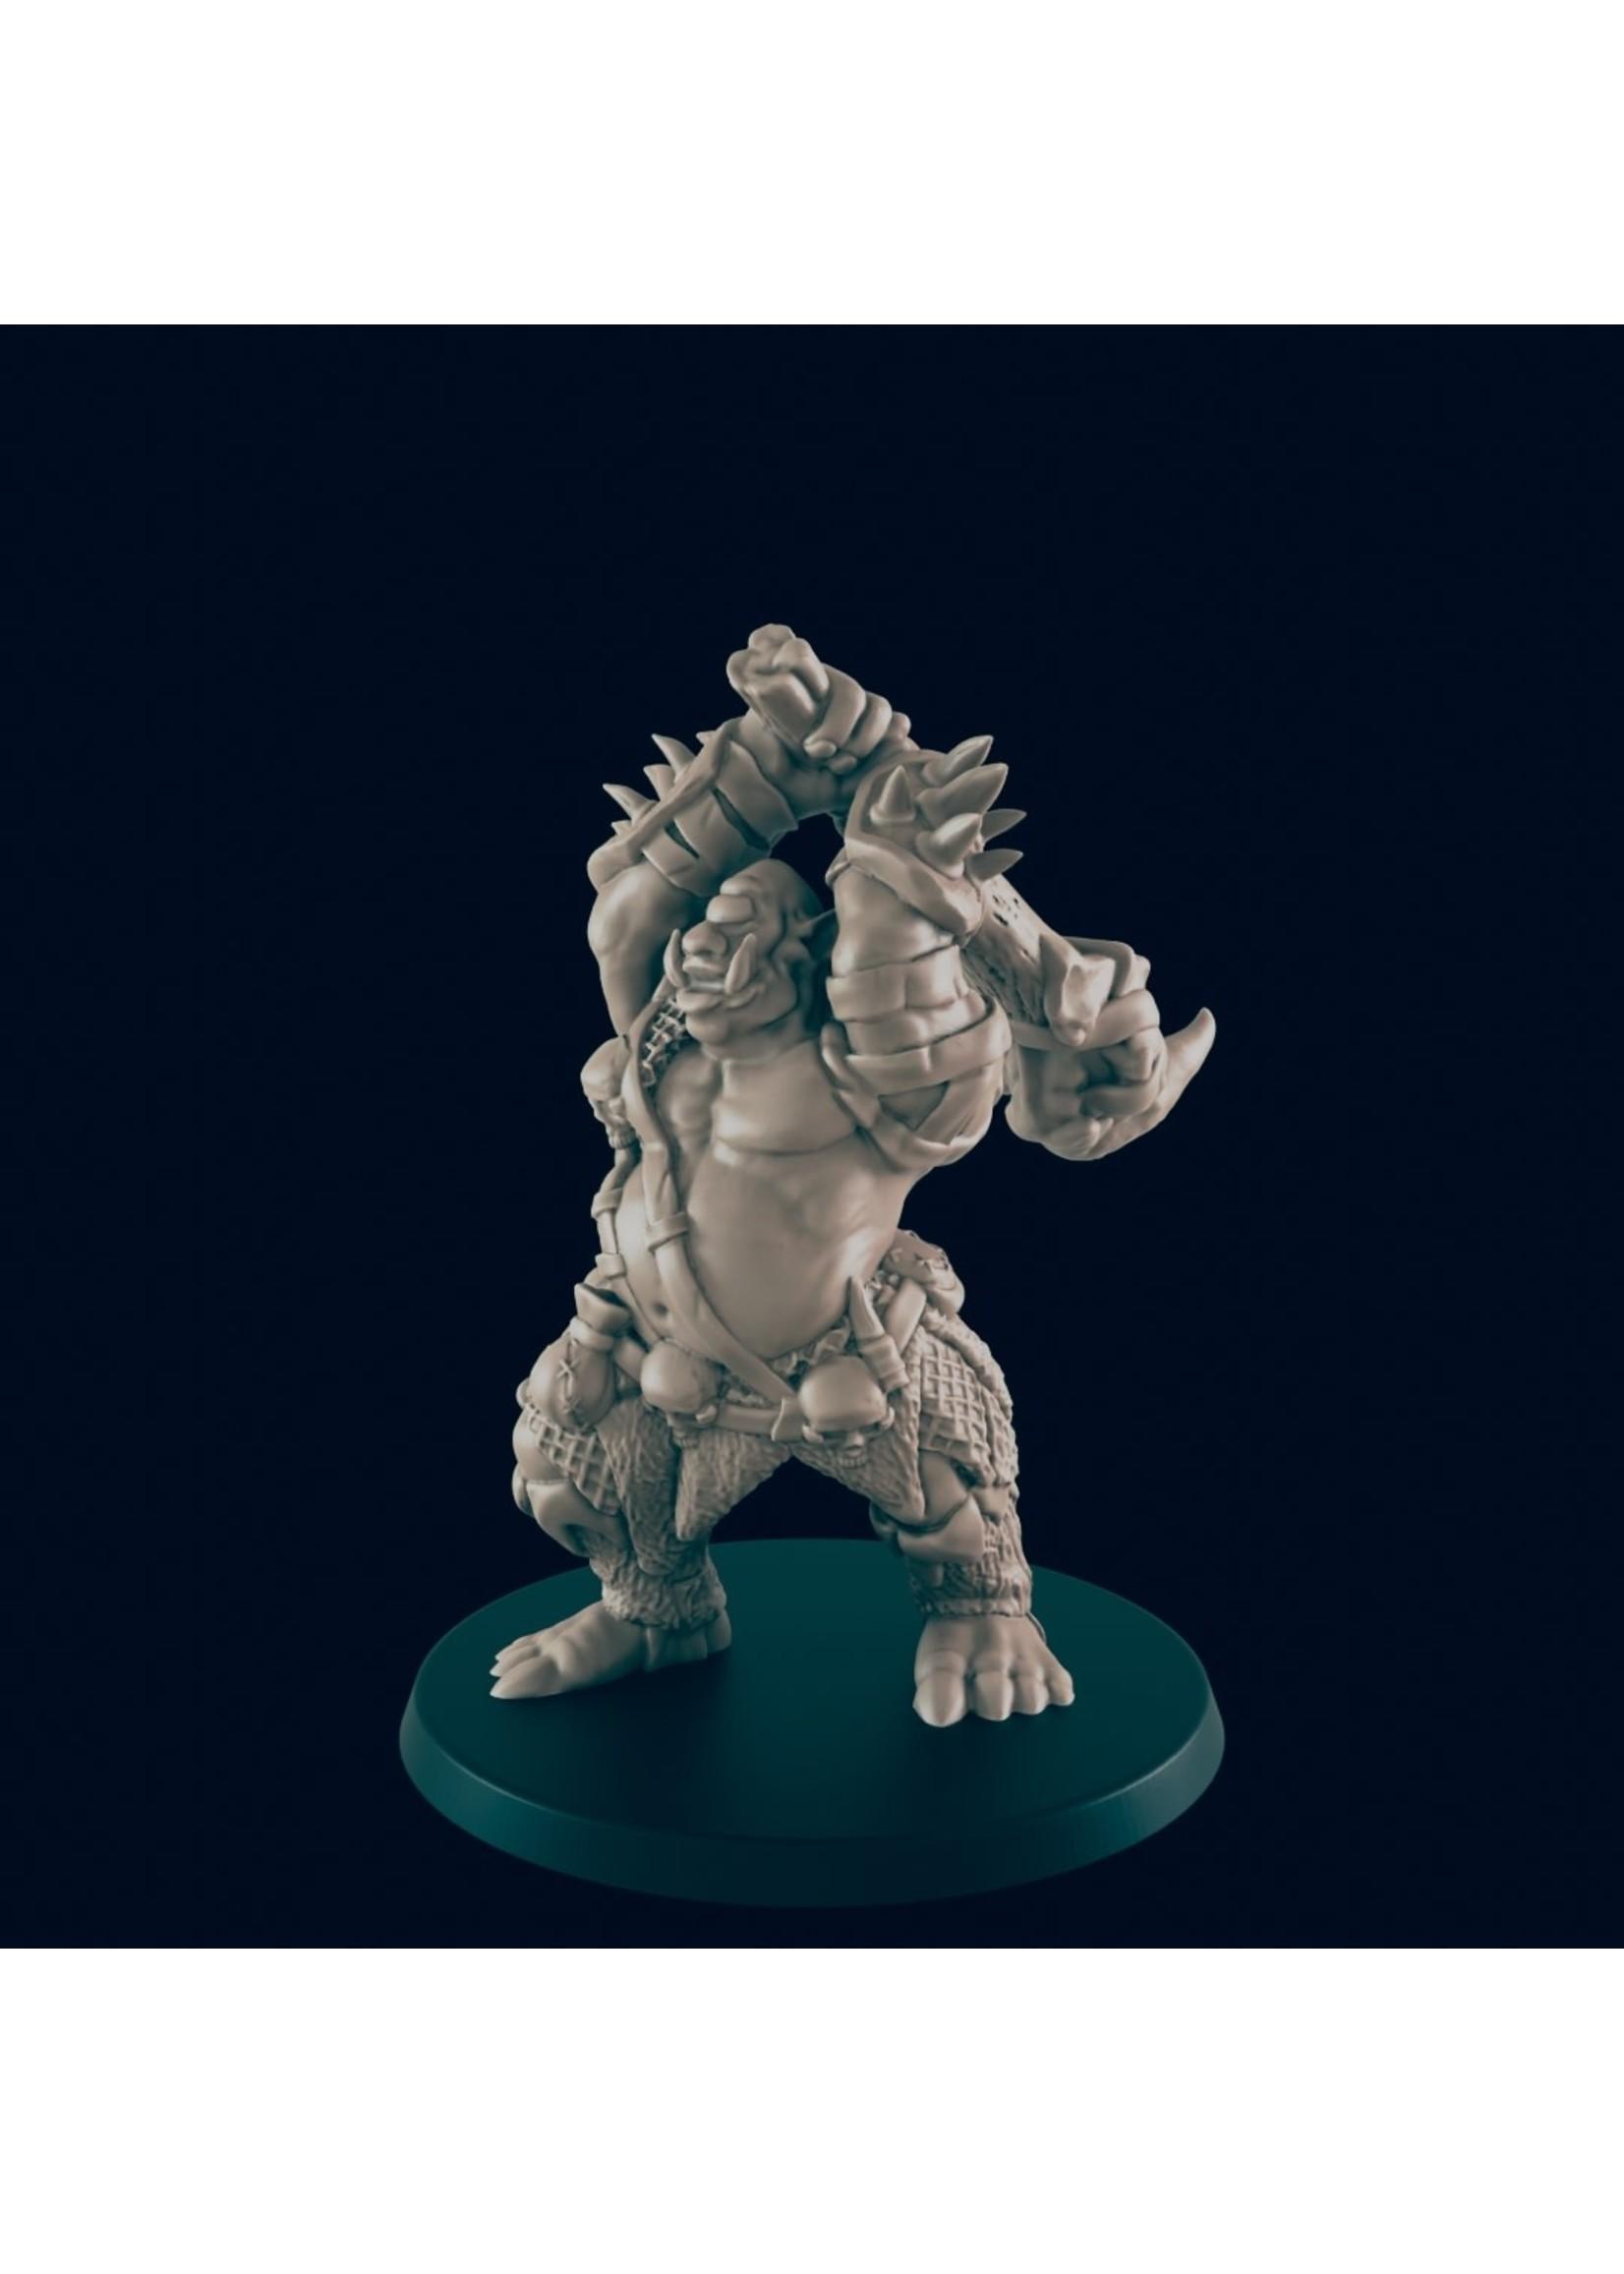 3D Printed Miniature - Cyclops - Dungeons & Dragons - Beasts and Baddies KS